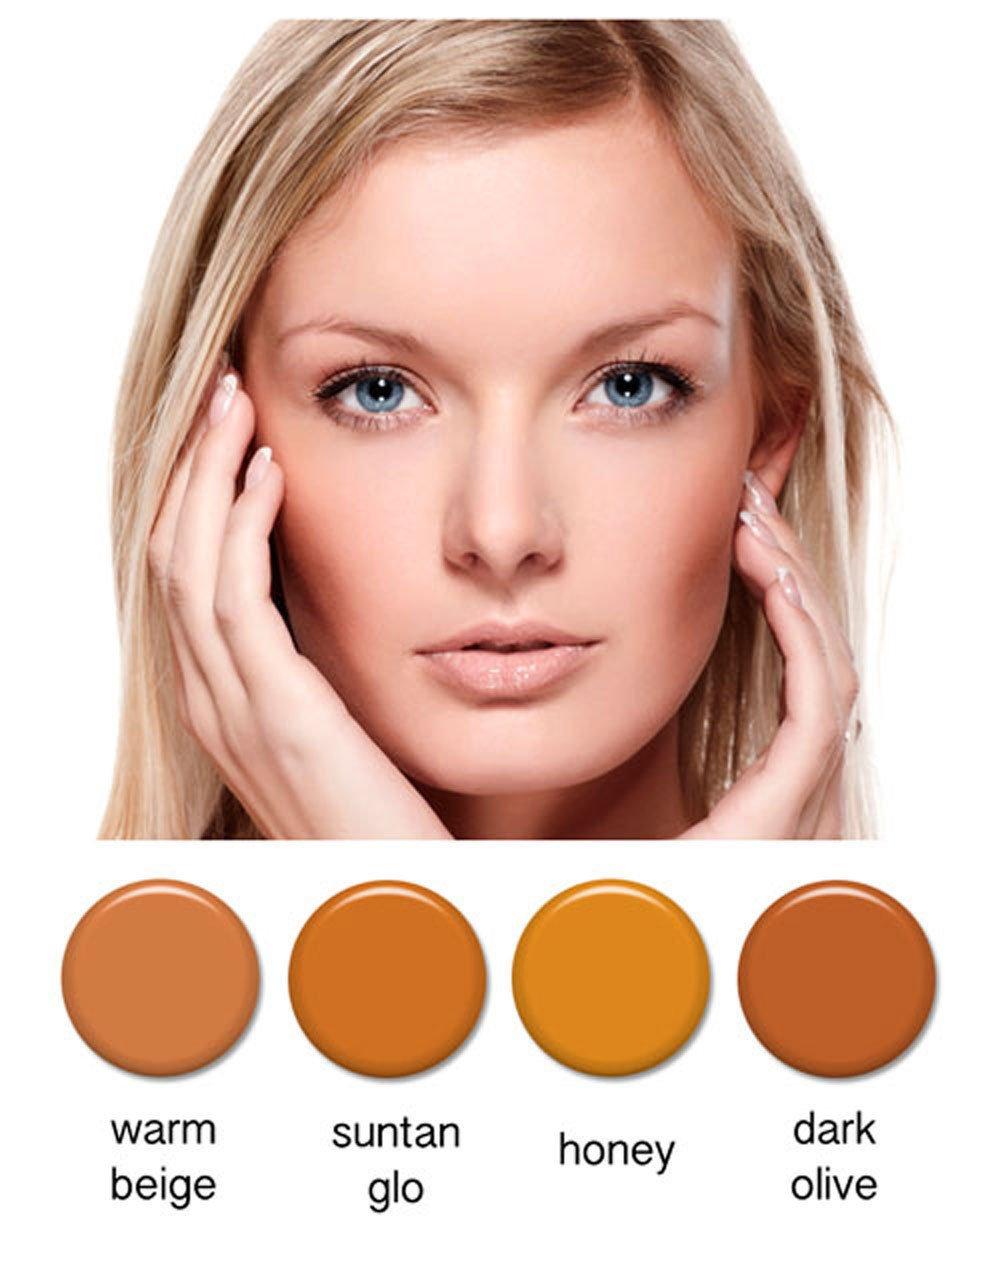 Art of Air 4pc MEDIUM complexion Professional Airbrush Cosmetic Makeup Set 1/2 oz bottles